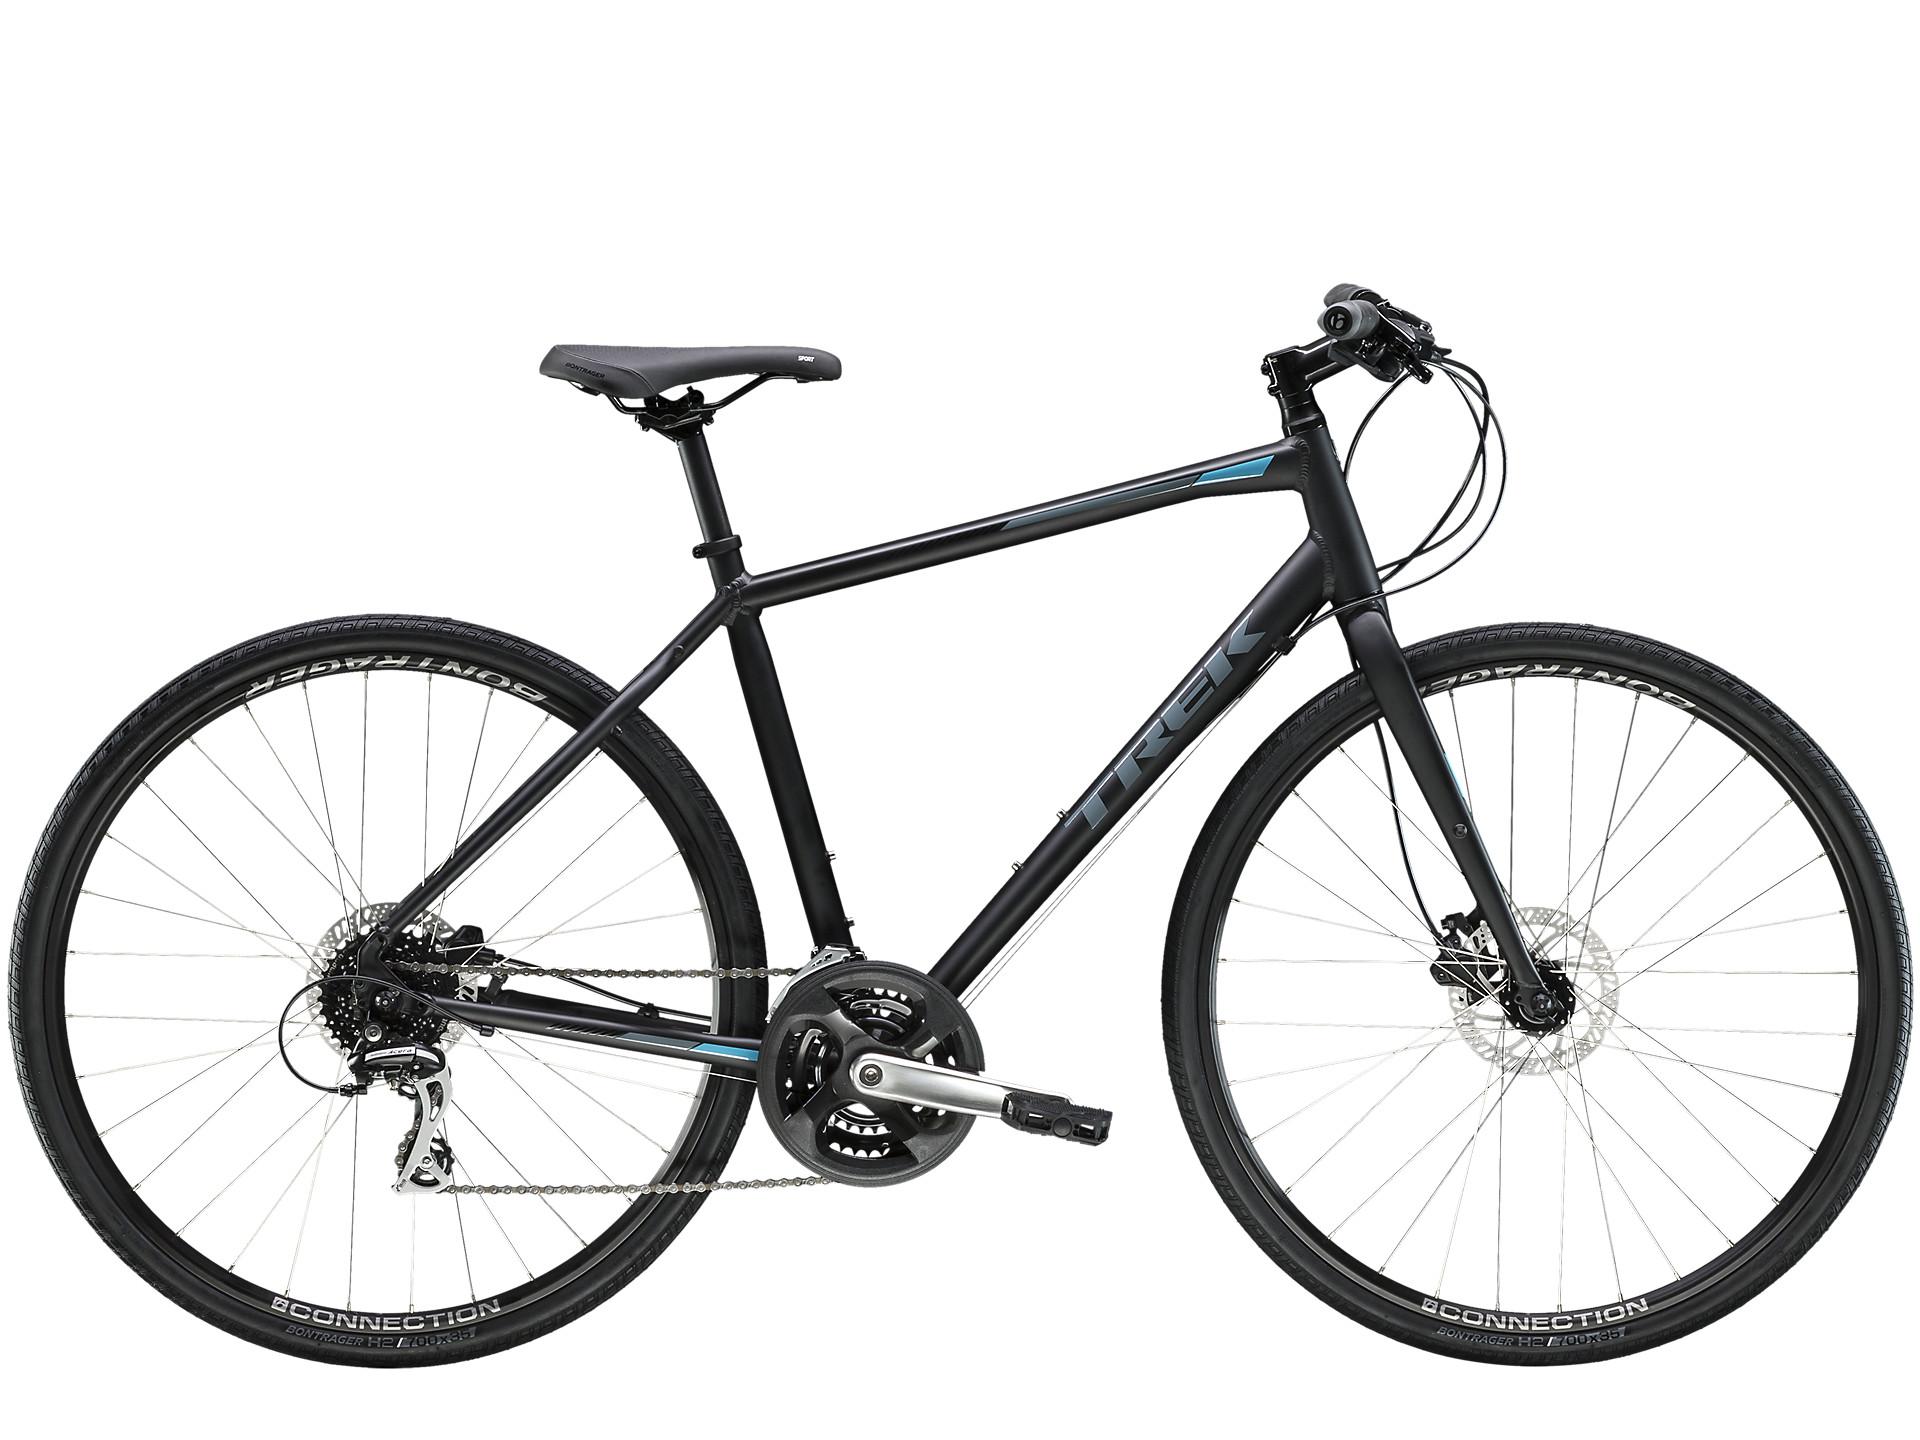 130eadd157d FX 2 Disc | Trek Bikes